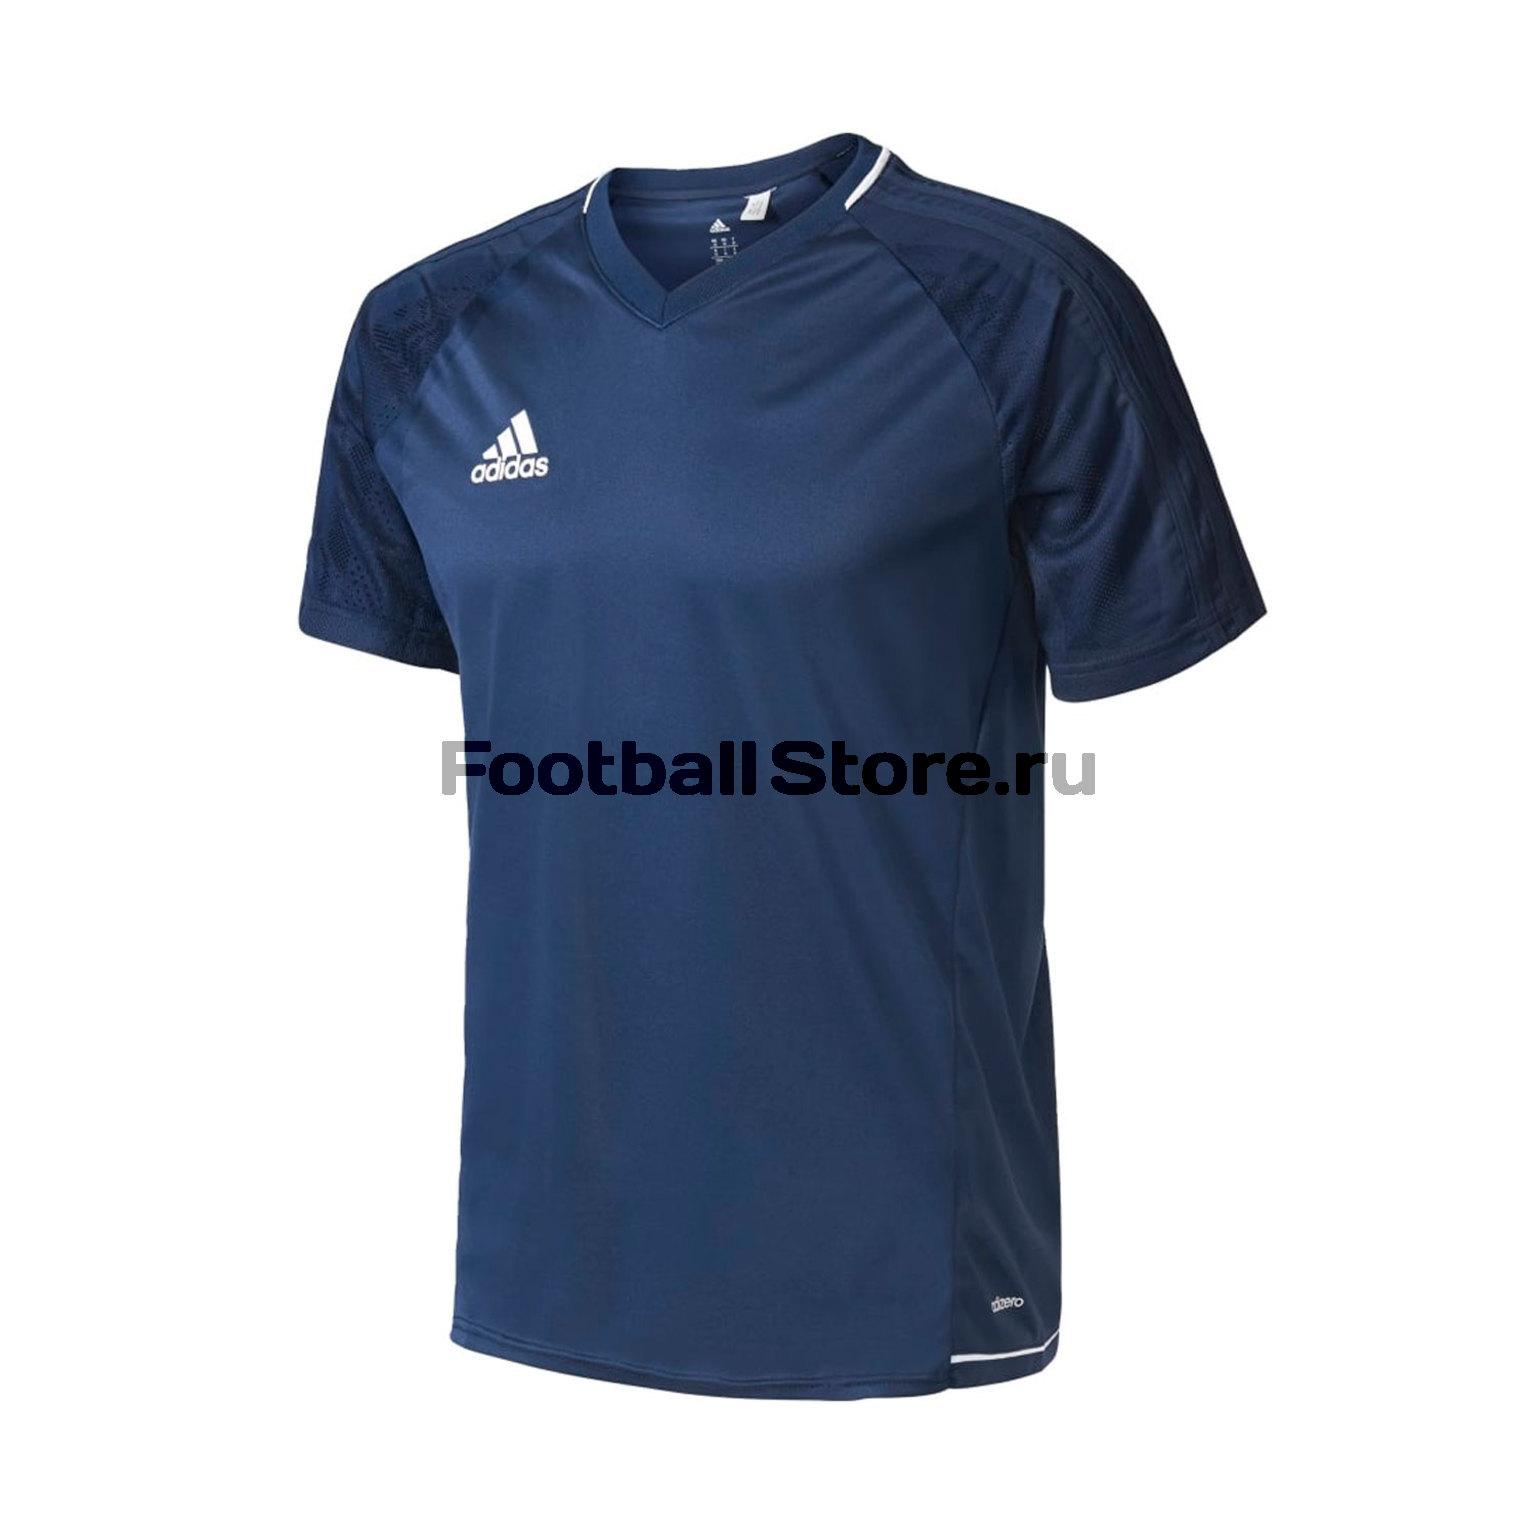 Футболка тренировочная Adidas Tiro17 Trg Jsy BQ2799